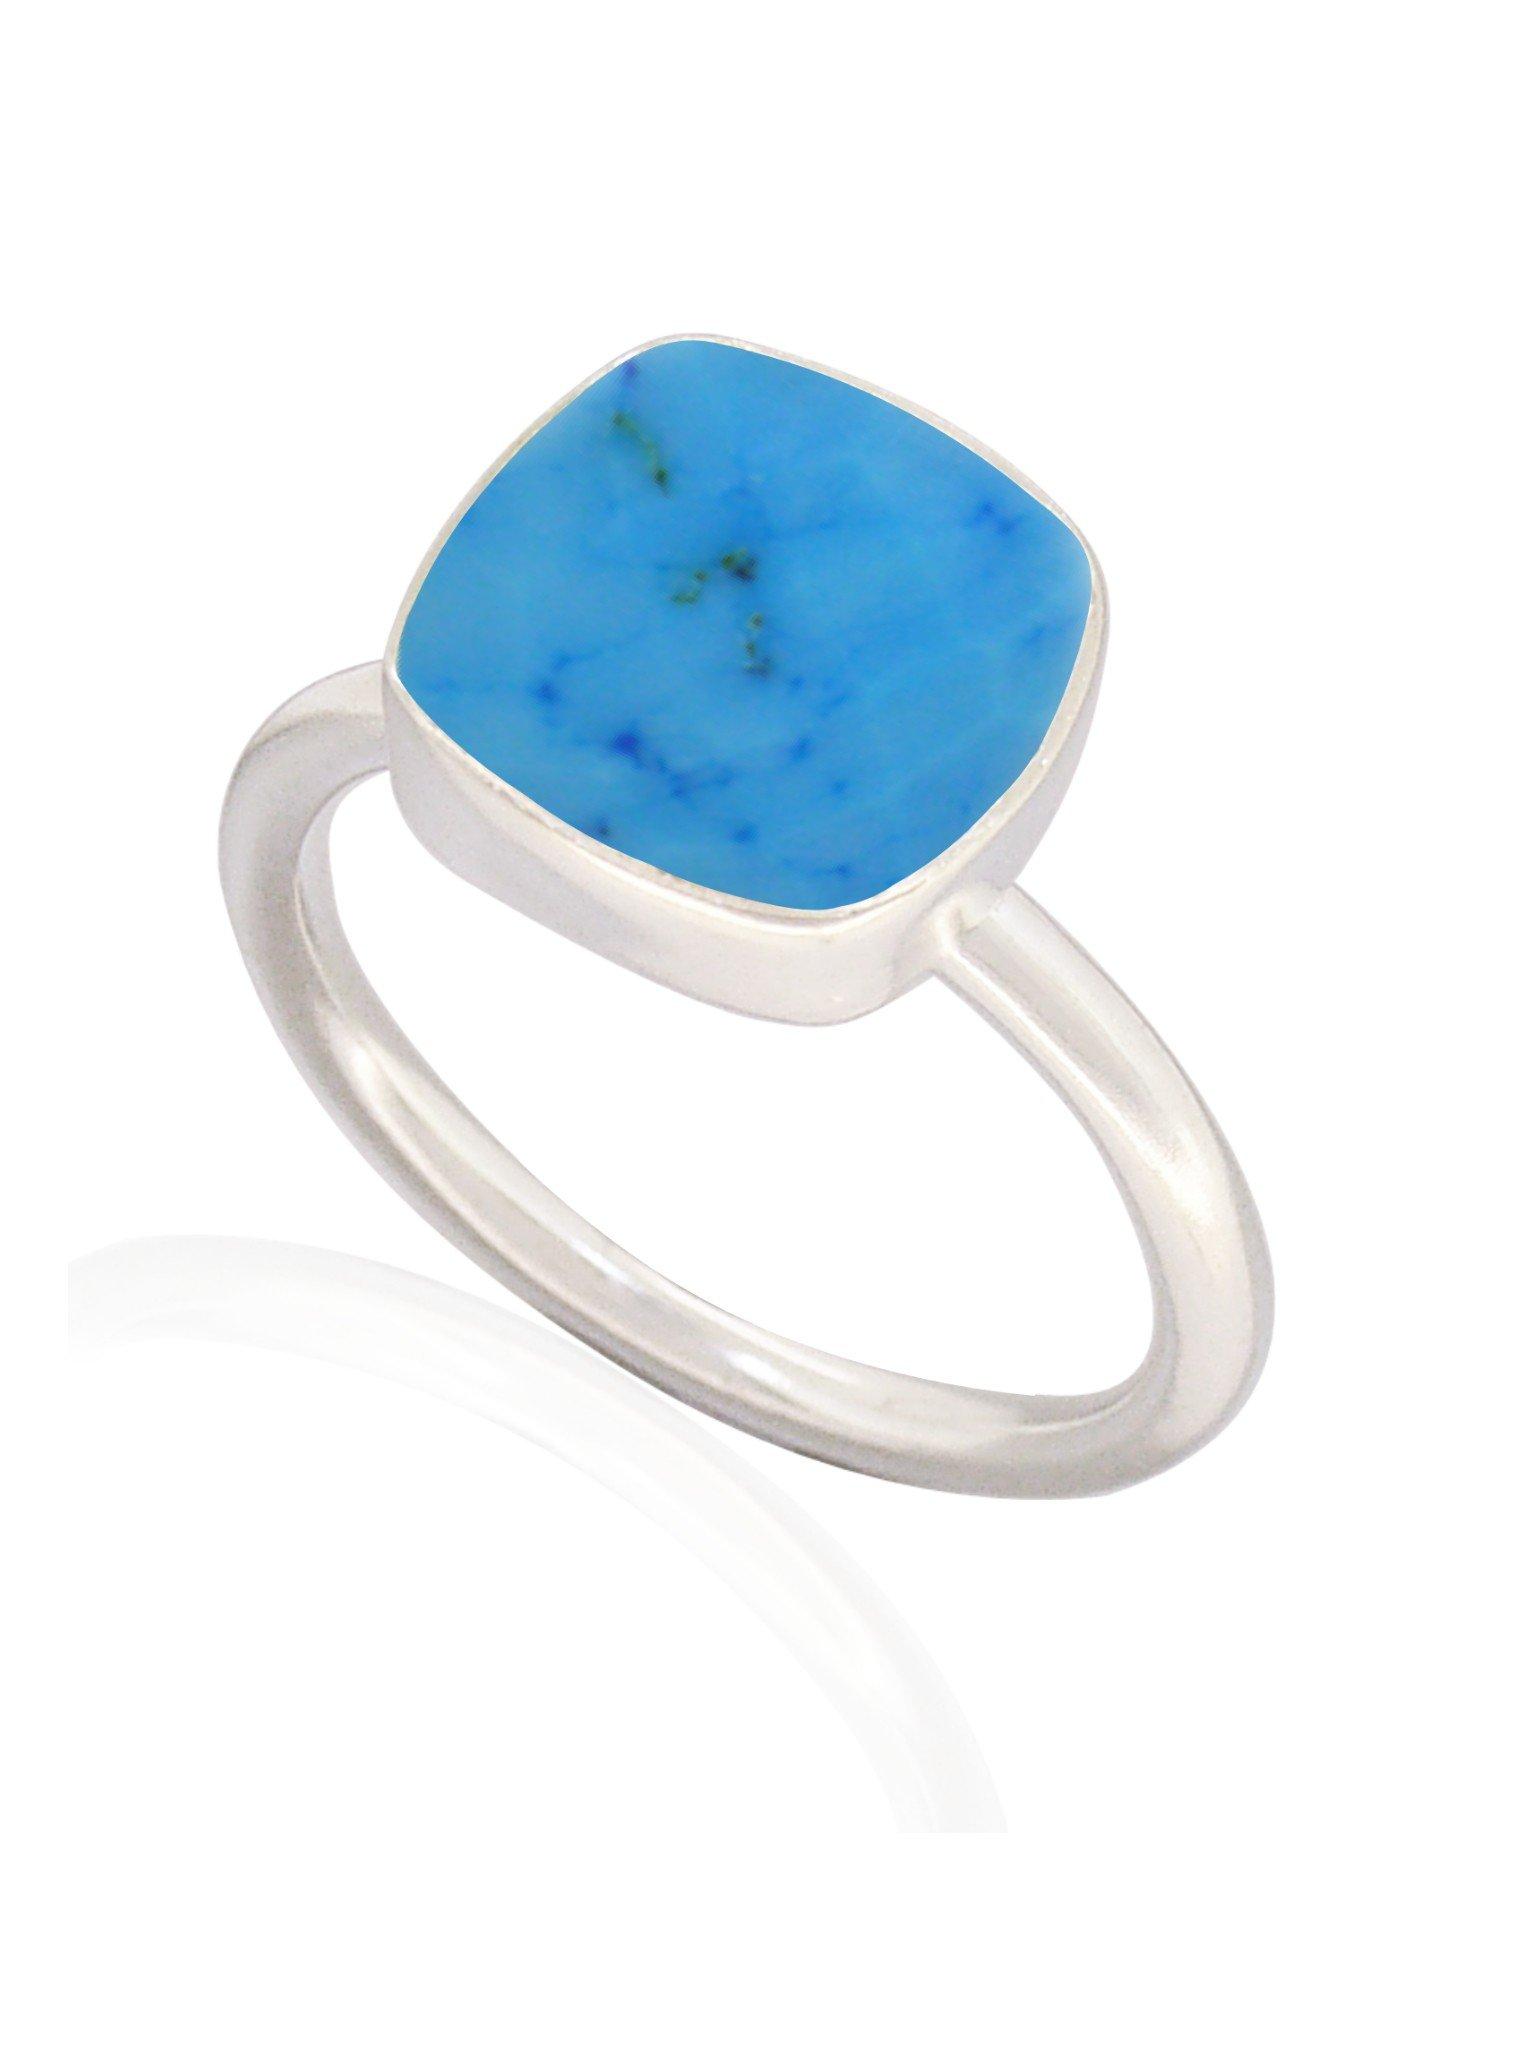 Indie Sleeping Beauty Turquoise Gemstone Ring Silver